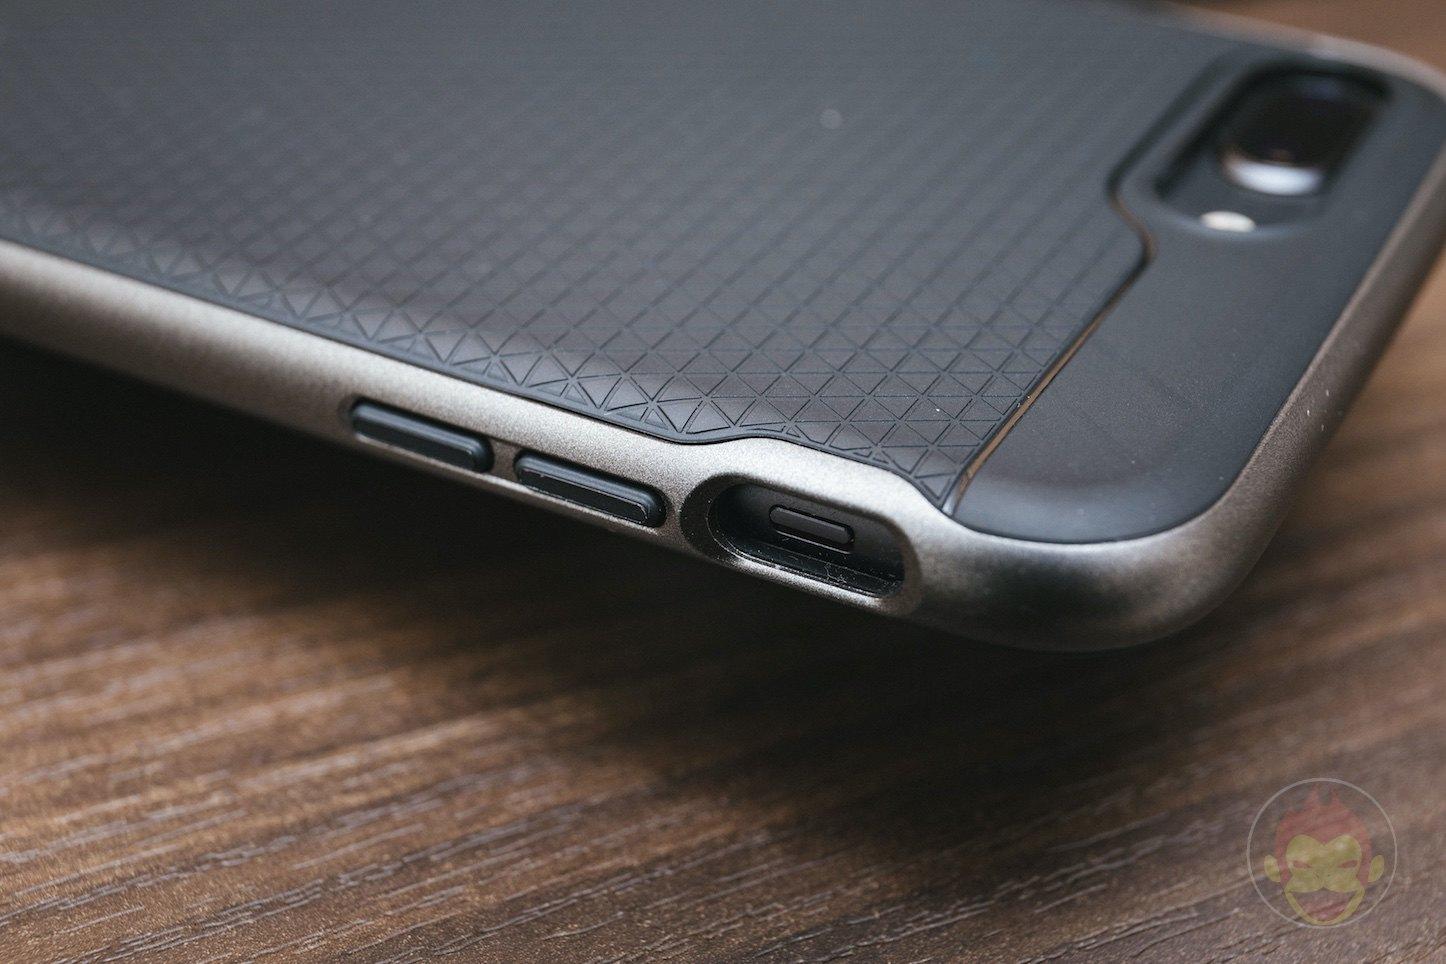 Spigen-Neo-Hybird-2-iPHone8Plus-Case-Review-07.jpg